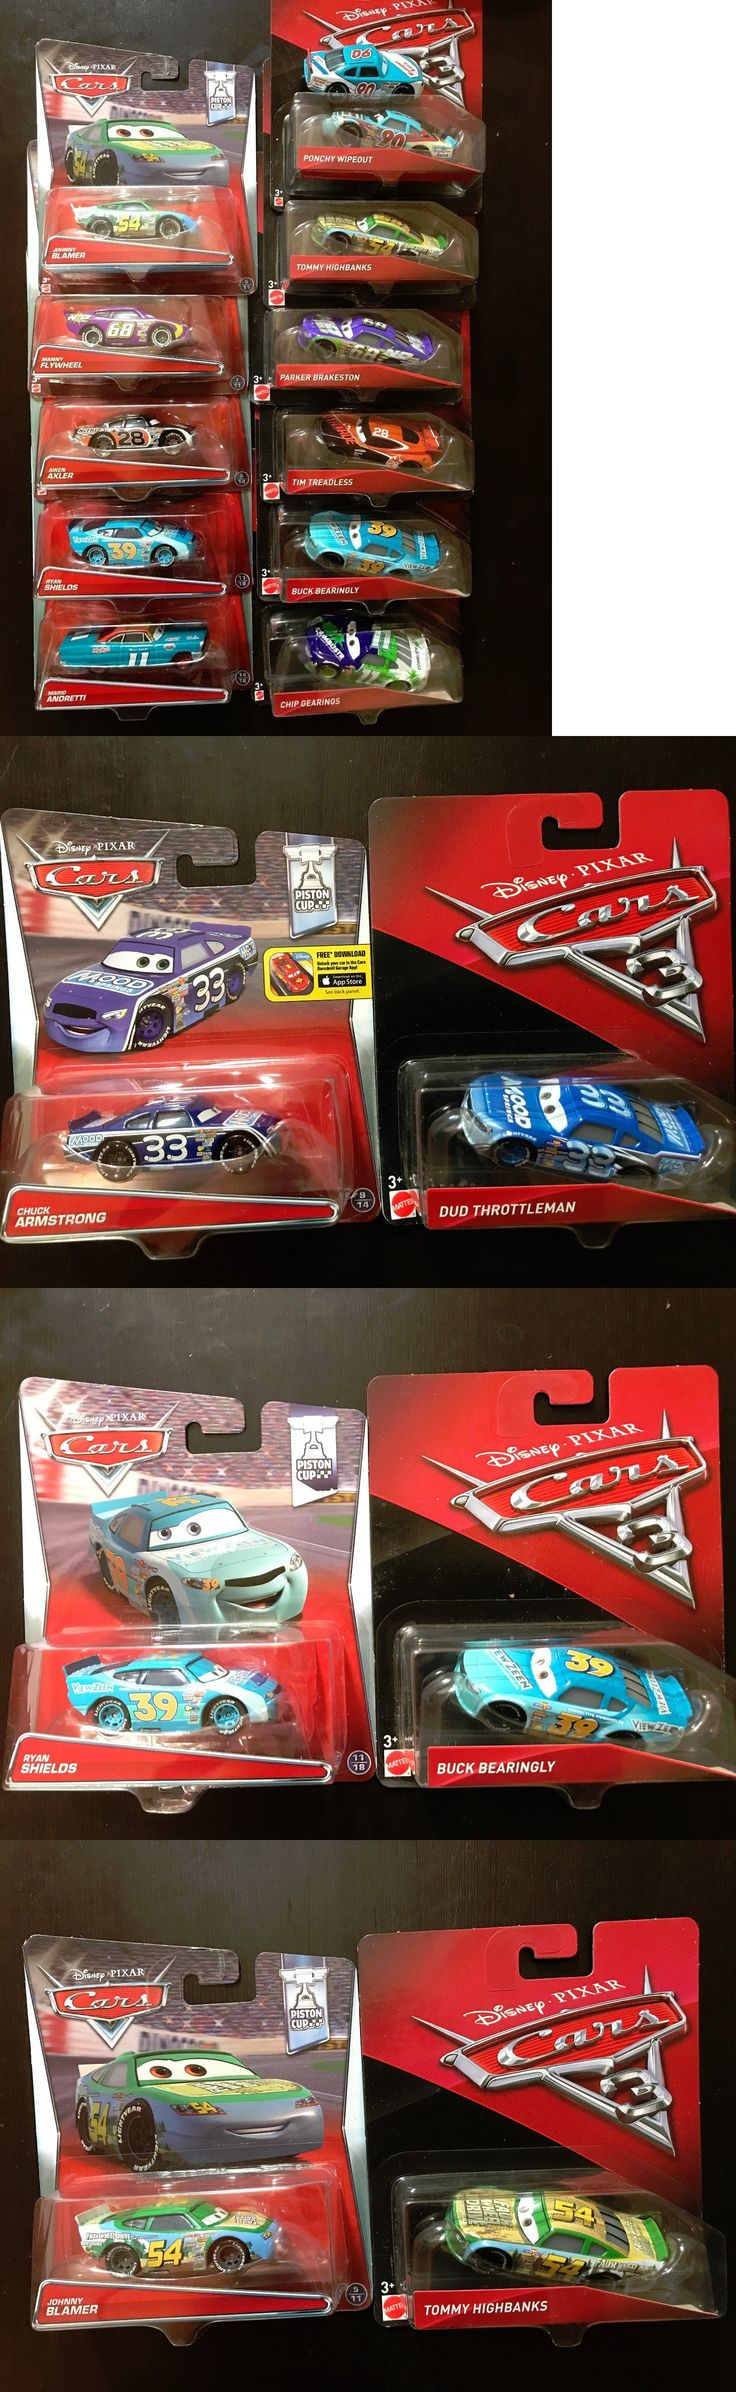 Mattel disney pixar cars 3 piston cup racers cars 1 to cars 3 visual - Cars 142316 Disney Pixar Cars 3 Piston Cup Racers Vs Cars 1 Racers Lot Vhtf